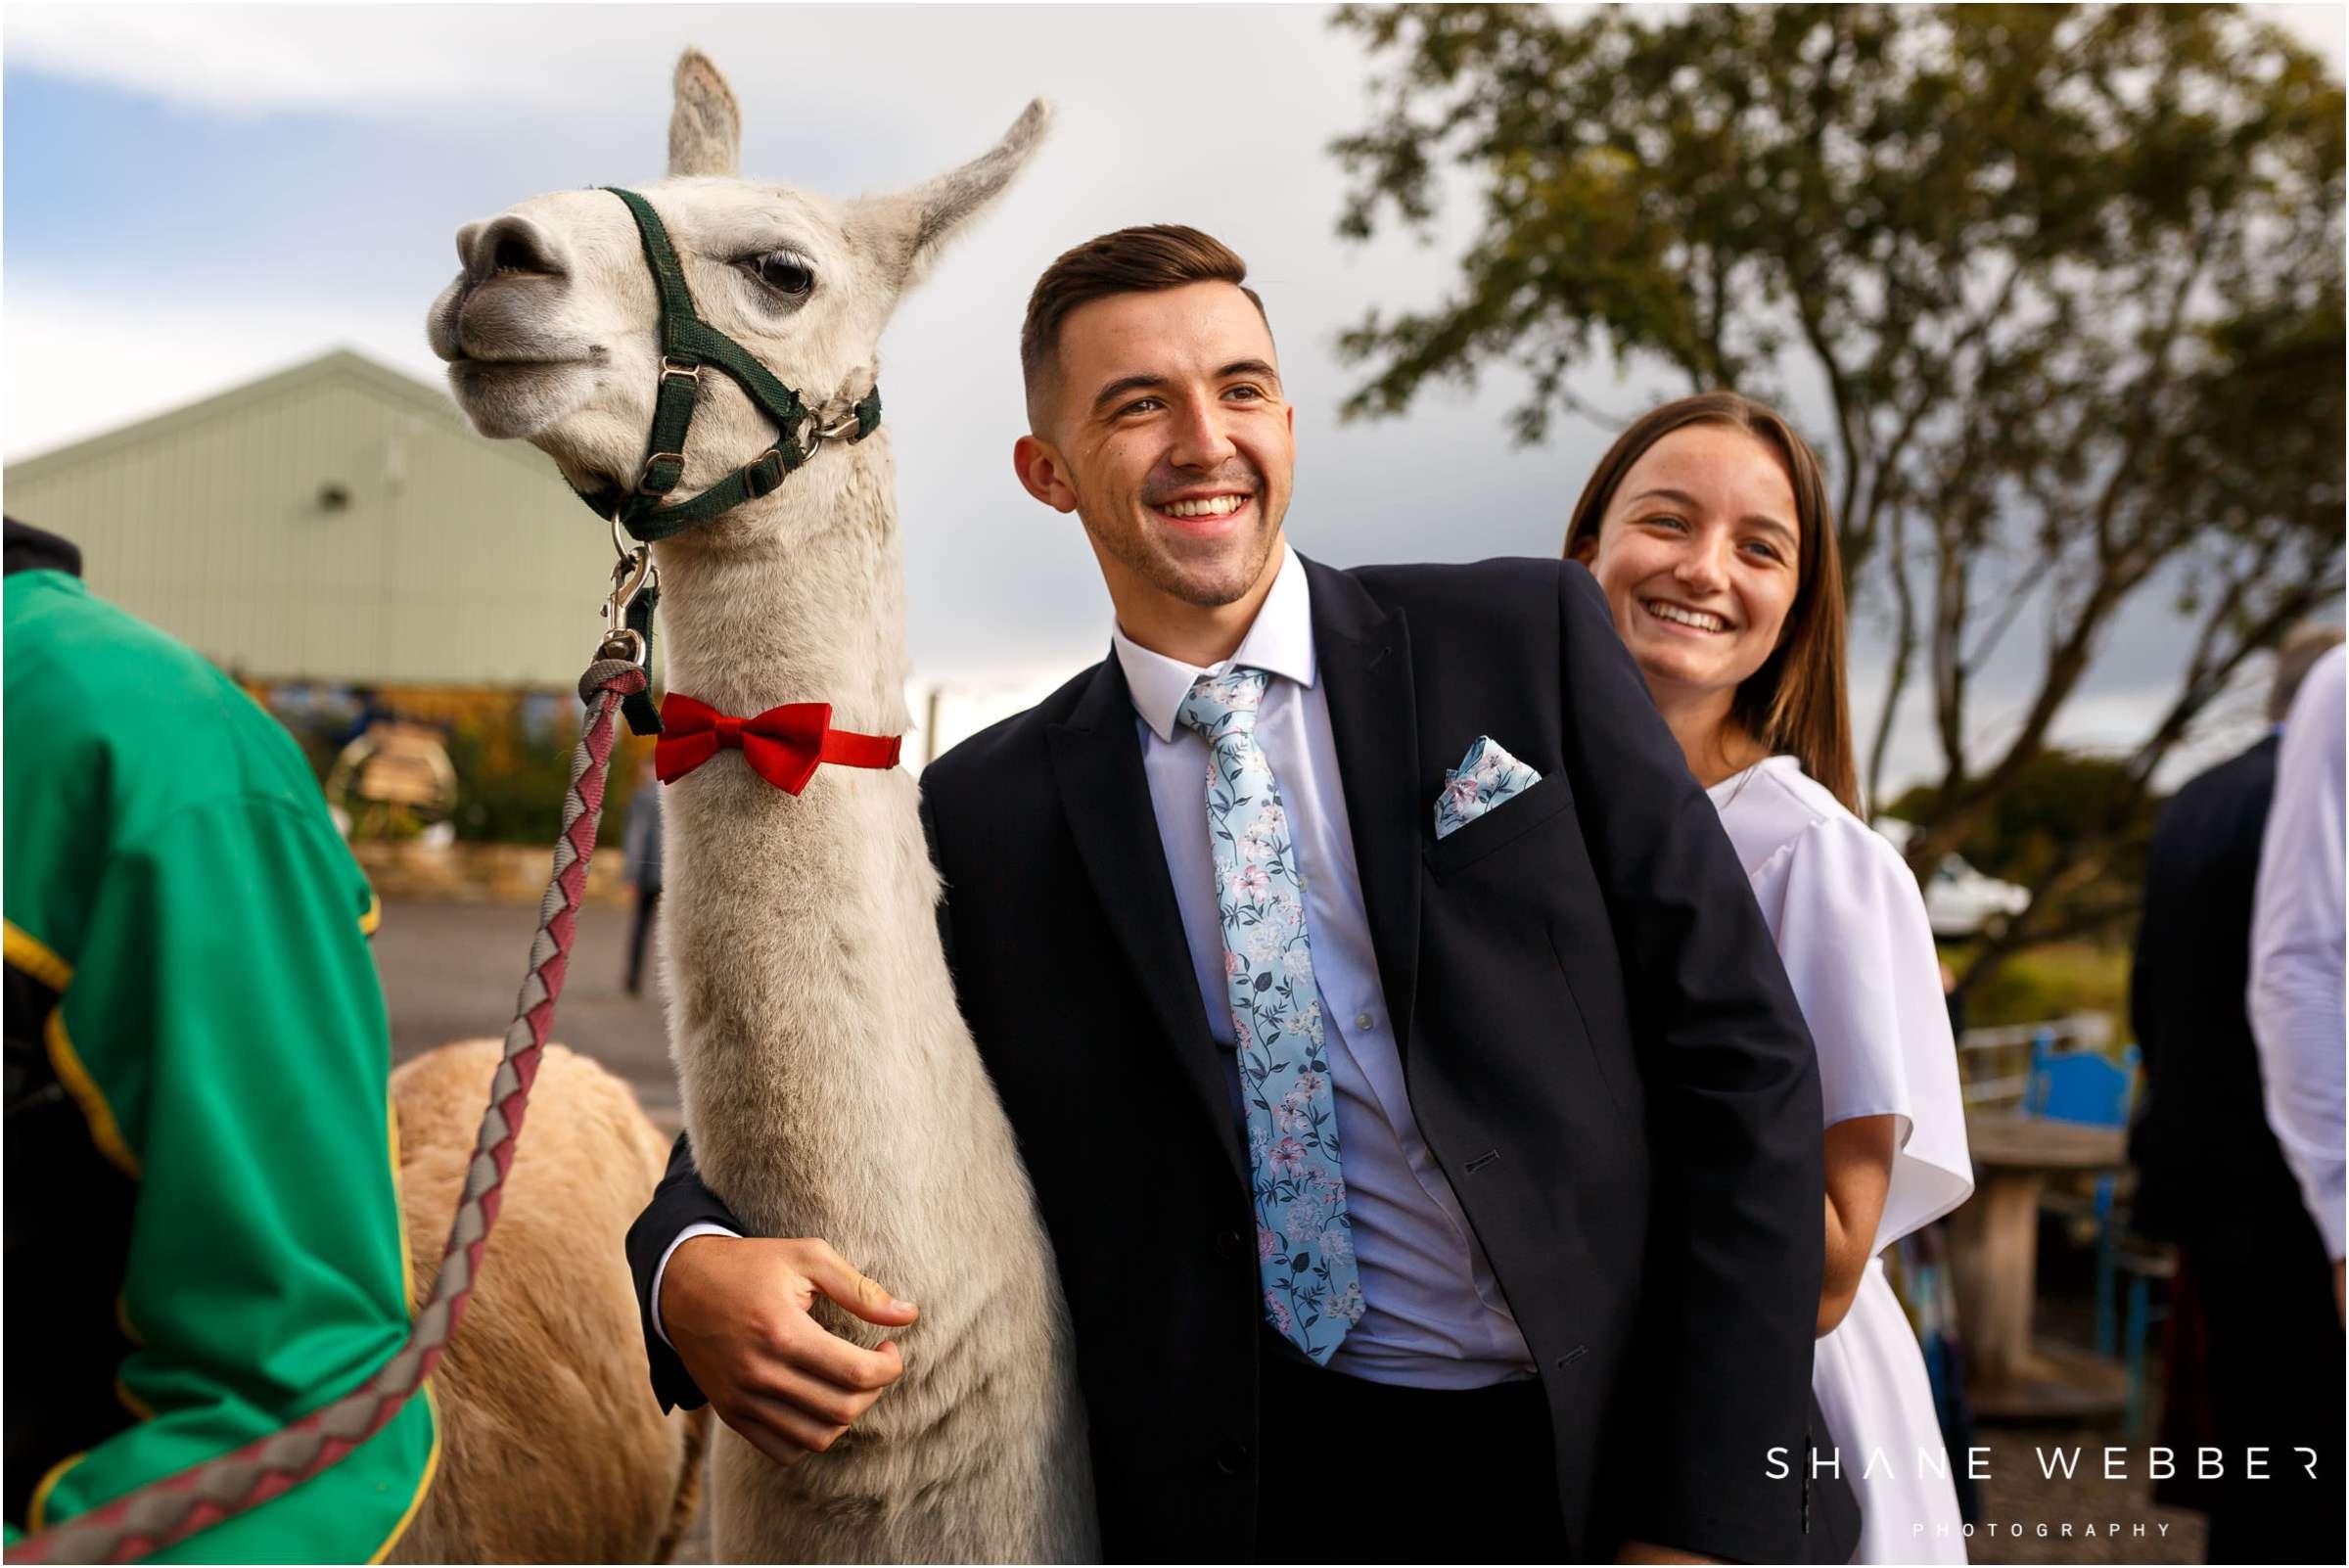 llama wearing bowtie